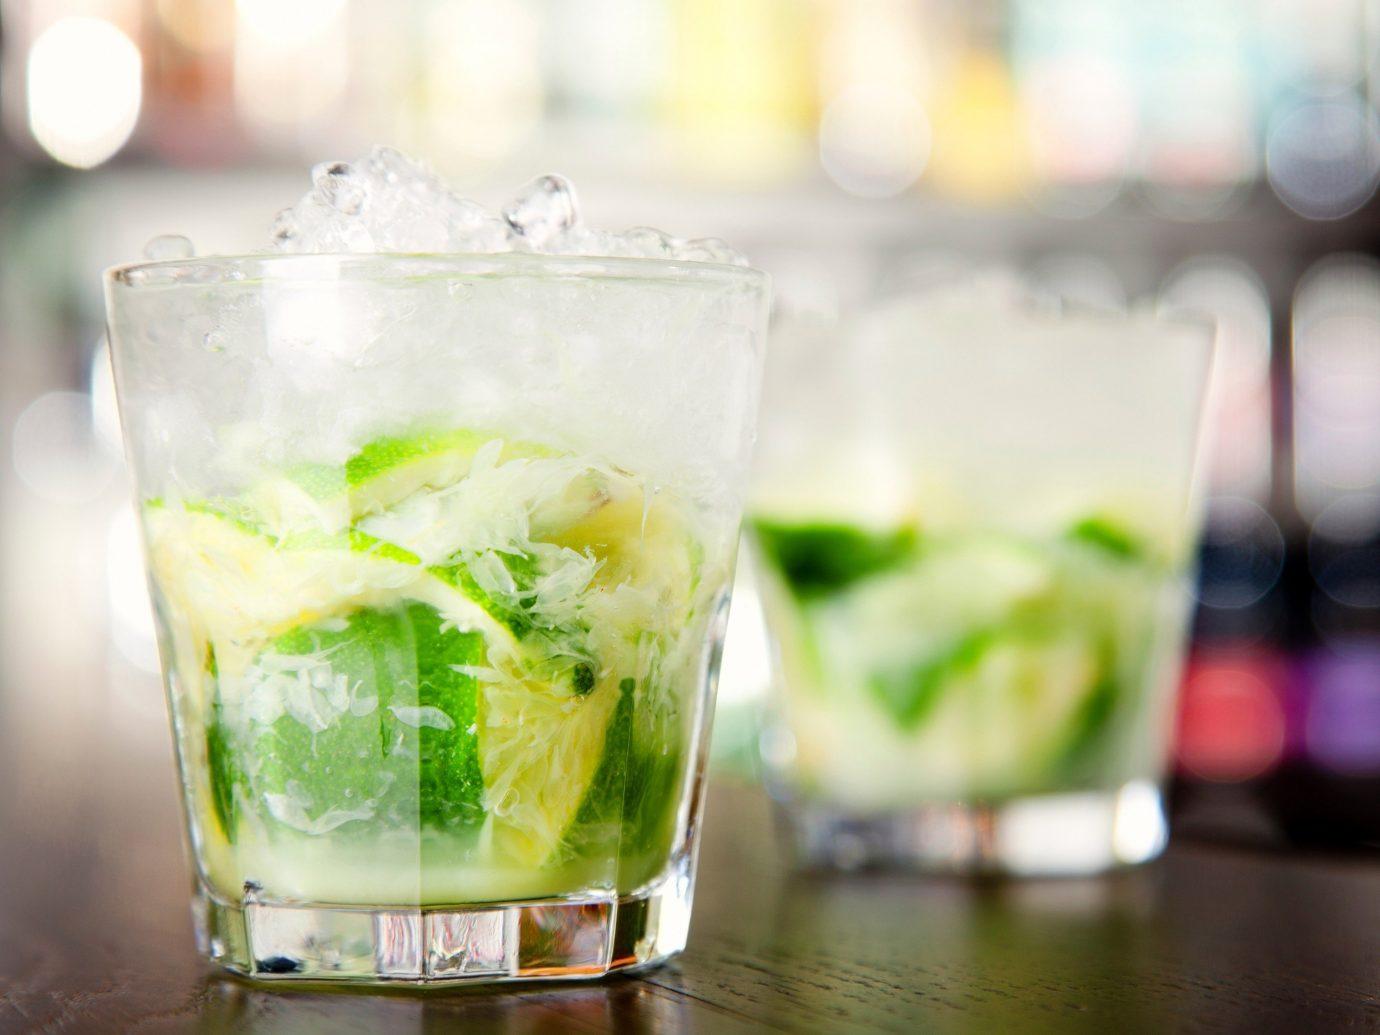 Jetsetter Guides Drink cocktail alcoholic beverage food caipirinha indoor mojito beverage glass distilled beverage caipiroska liqueur non alcoholic beverage mint julep alcohol